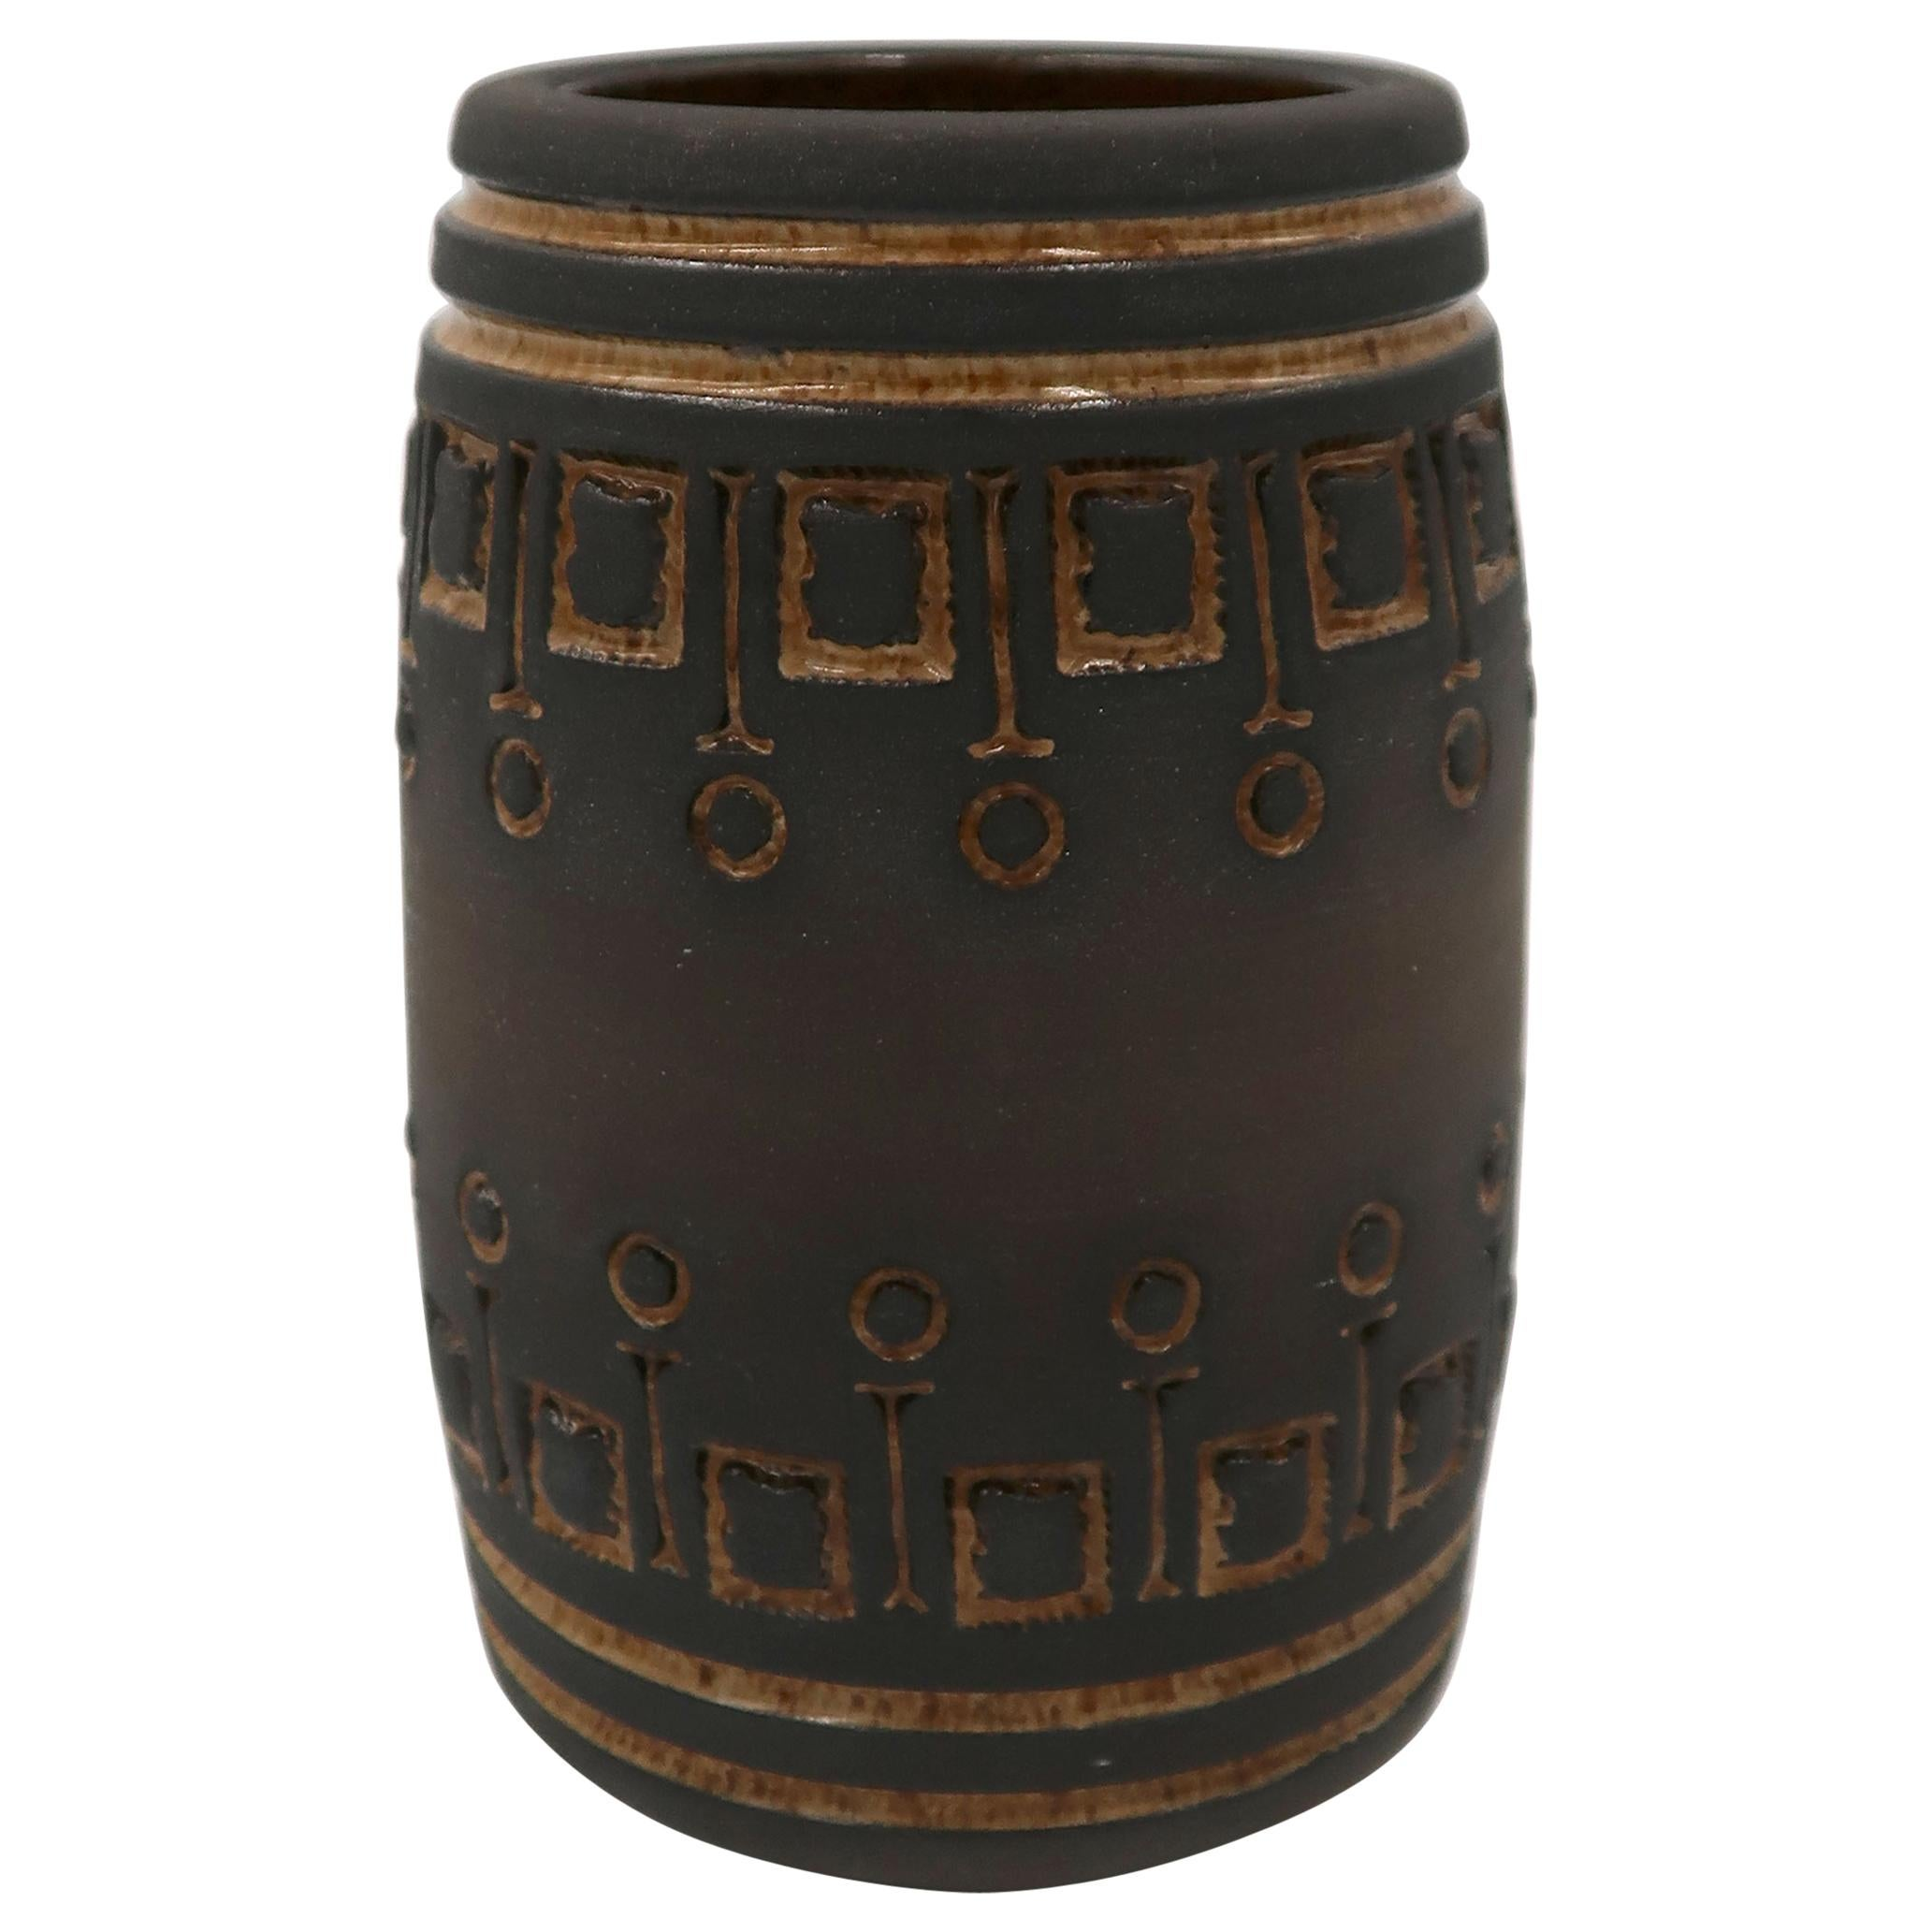 Rustic Swedish Modern Ulla Winblad for Alingsås Brown Decorated Vase, 1960s